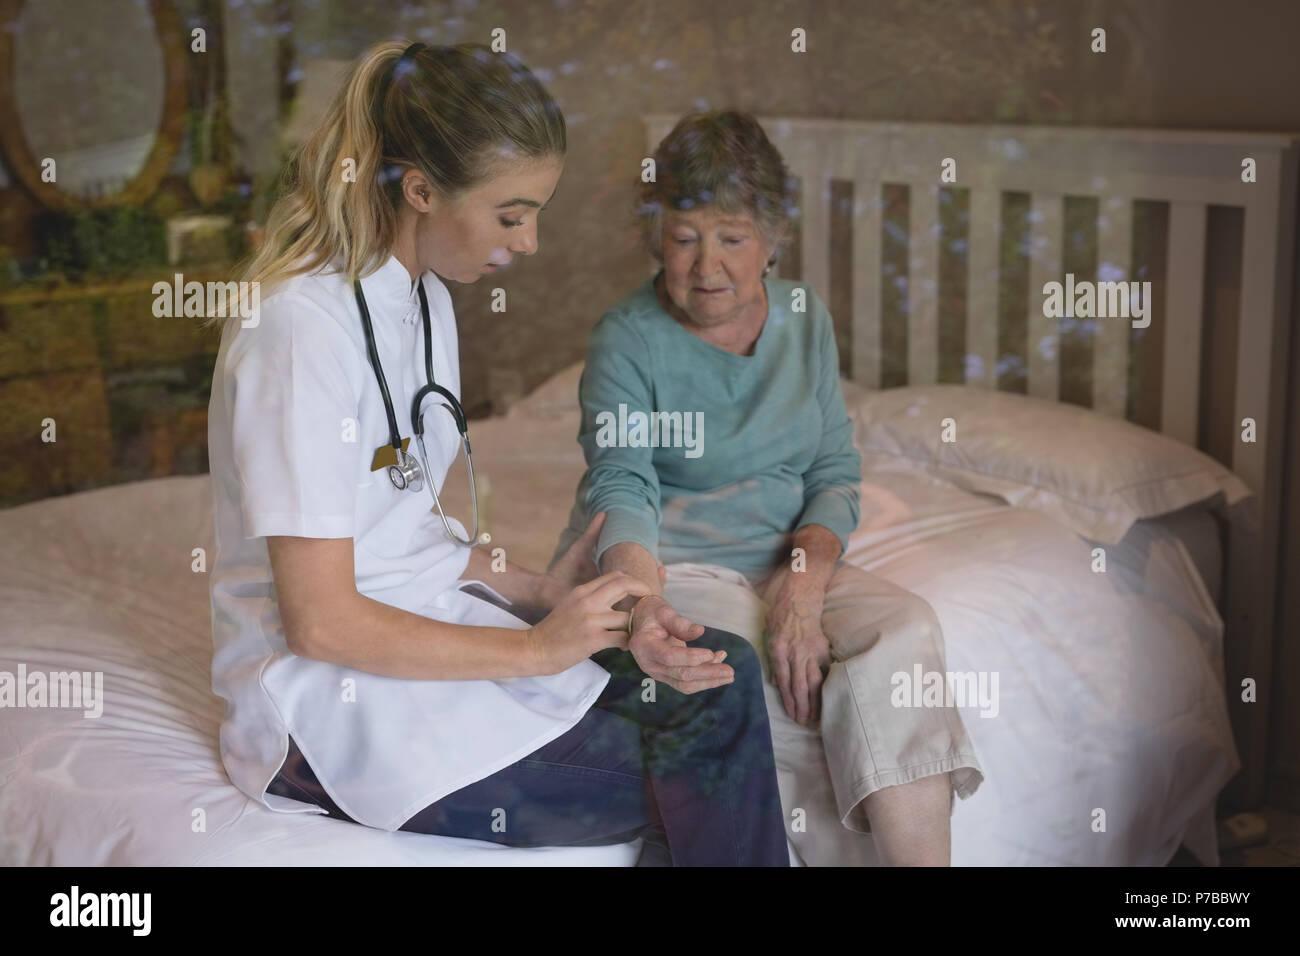 Physiotherapist examining a senior woman - Stock Image